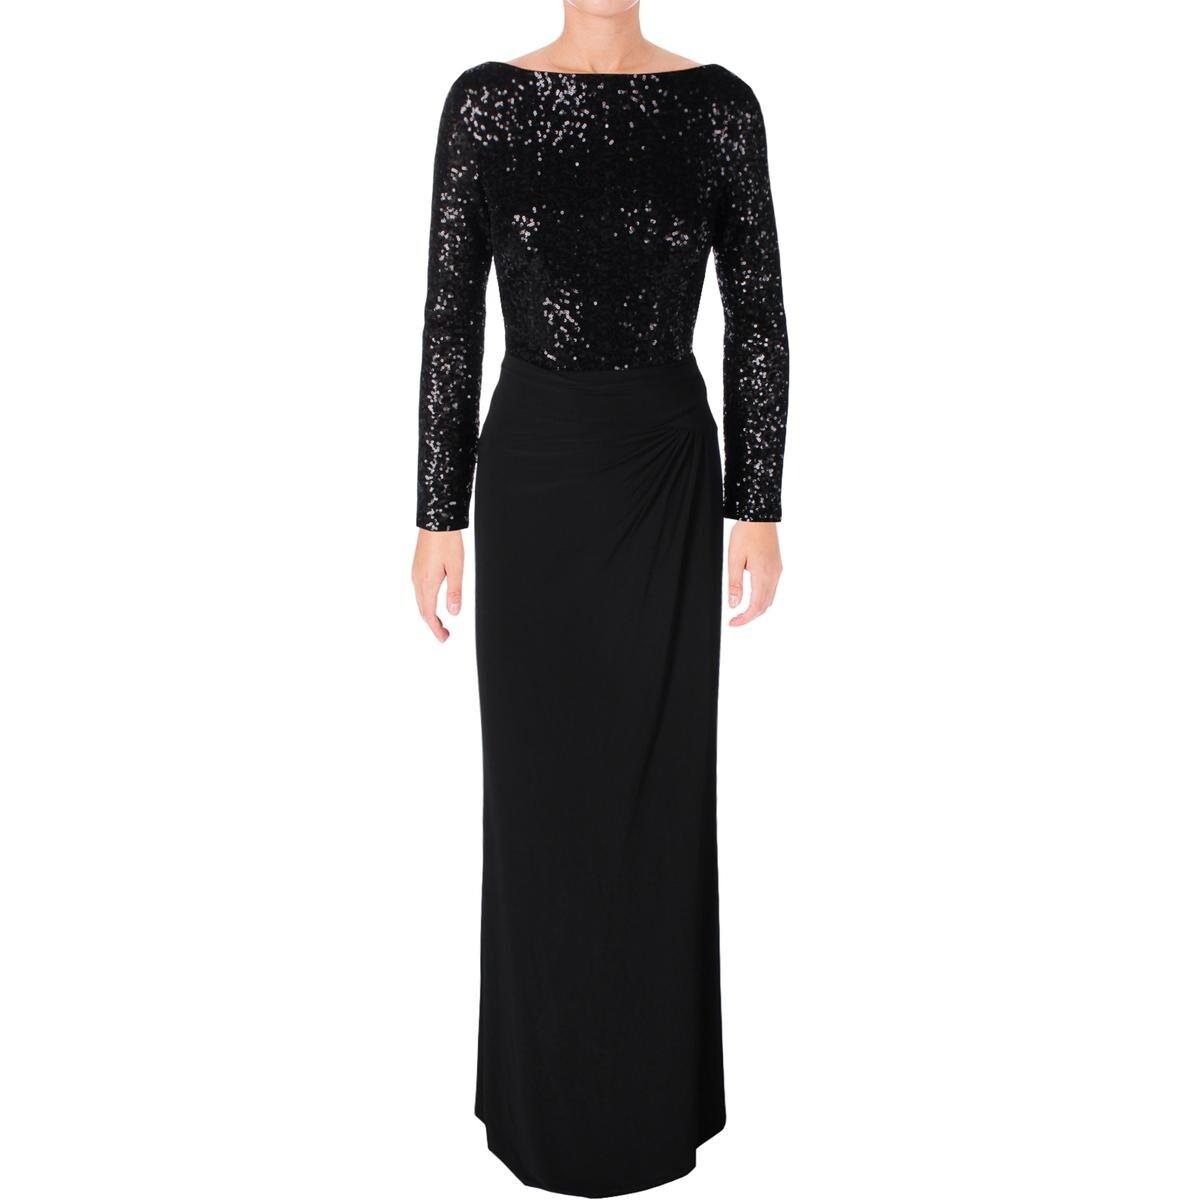 Shop Lauren Ralph Lauren Womens Oleanne Evening Dress Sequined Long ...